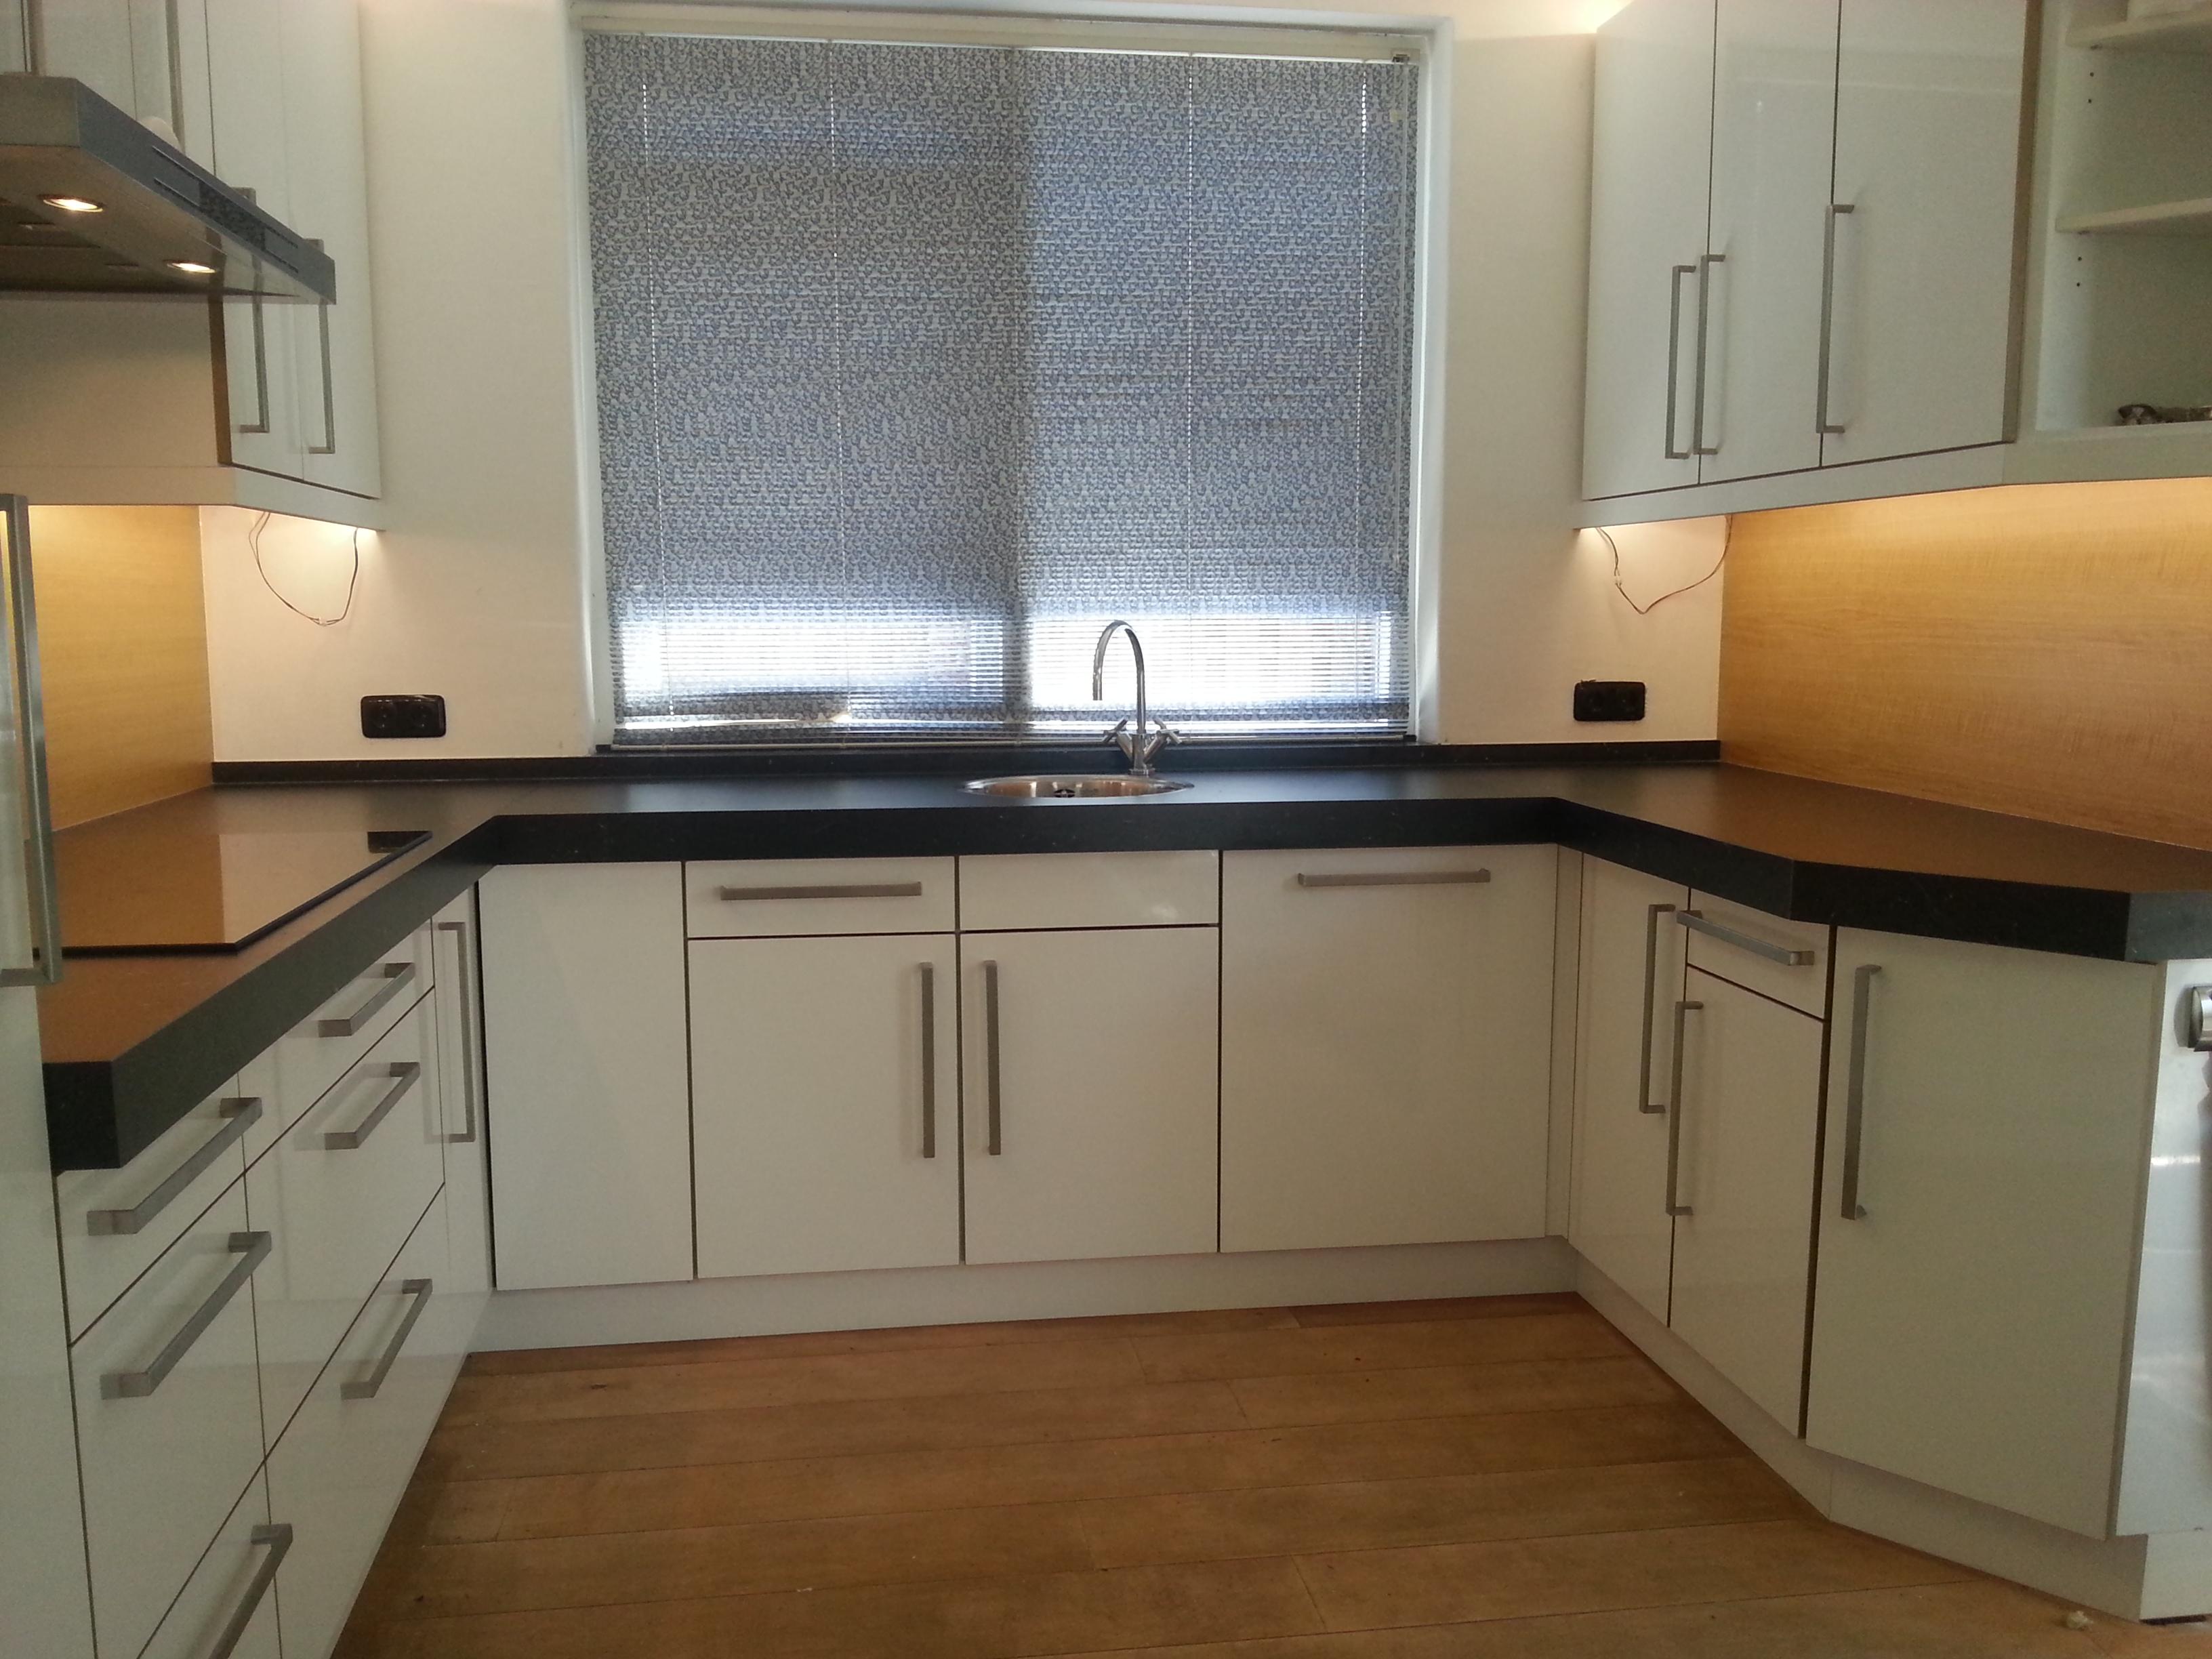 Keuken Keukenrenovatie : keukenrenovatie RIMO Interieurdesign